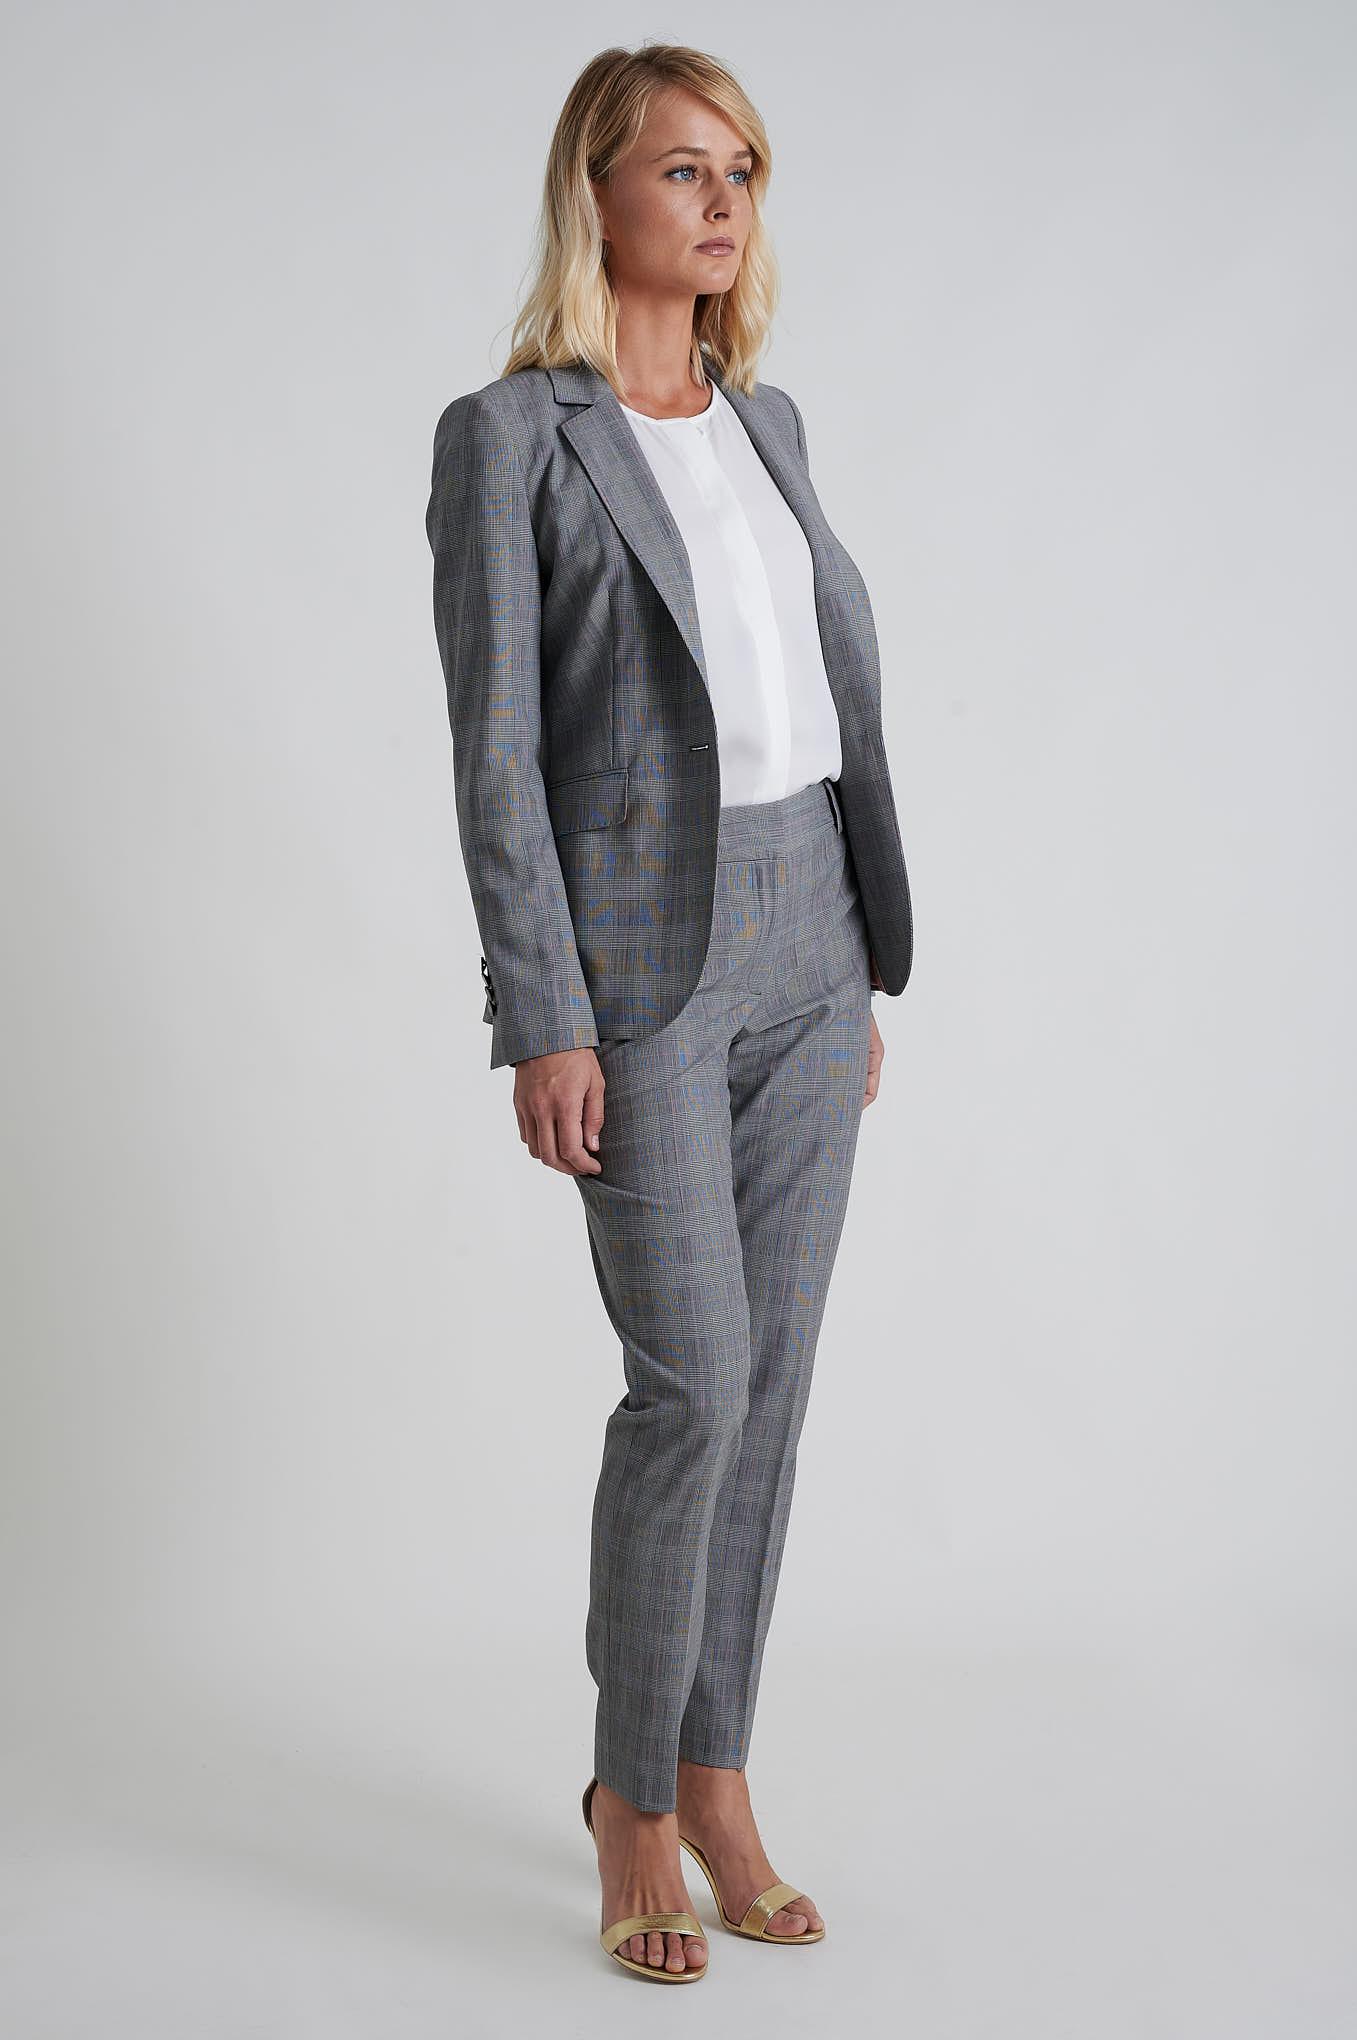 Suit Grey Formal Woman